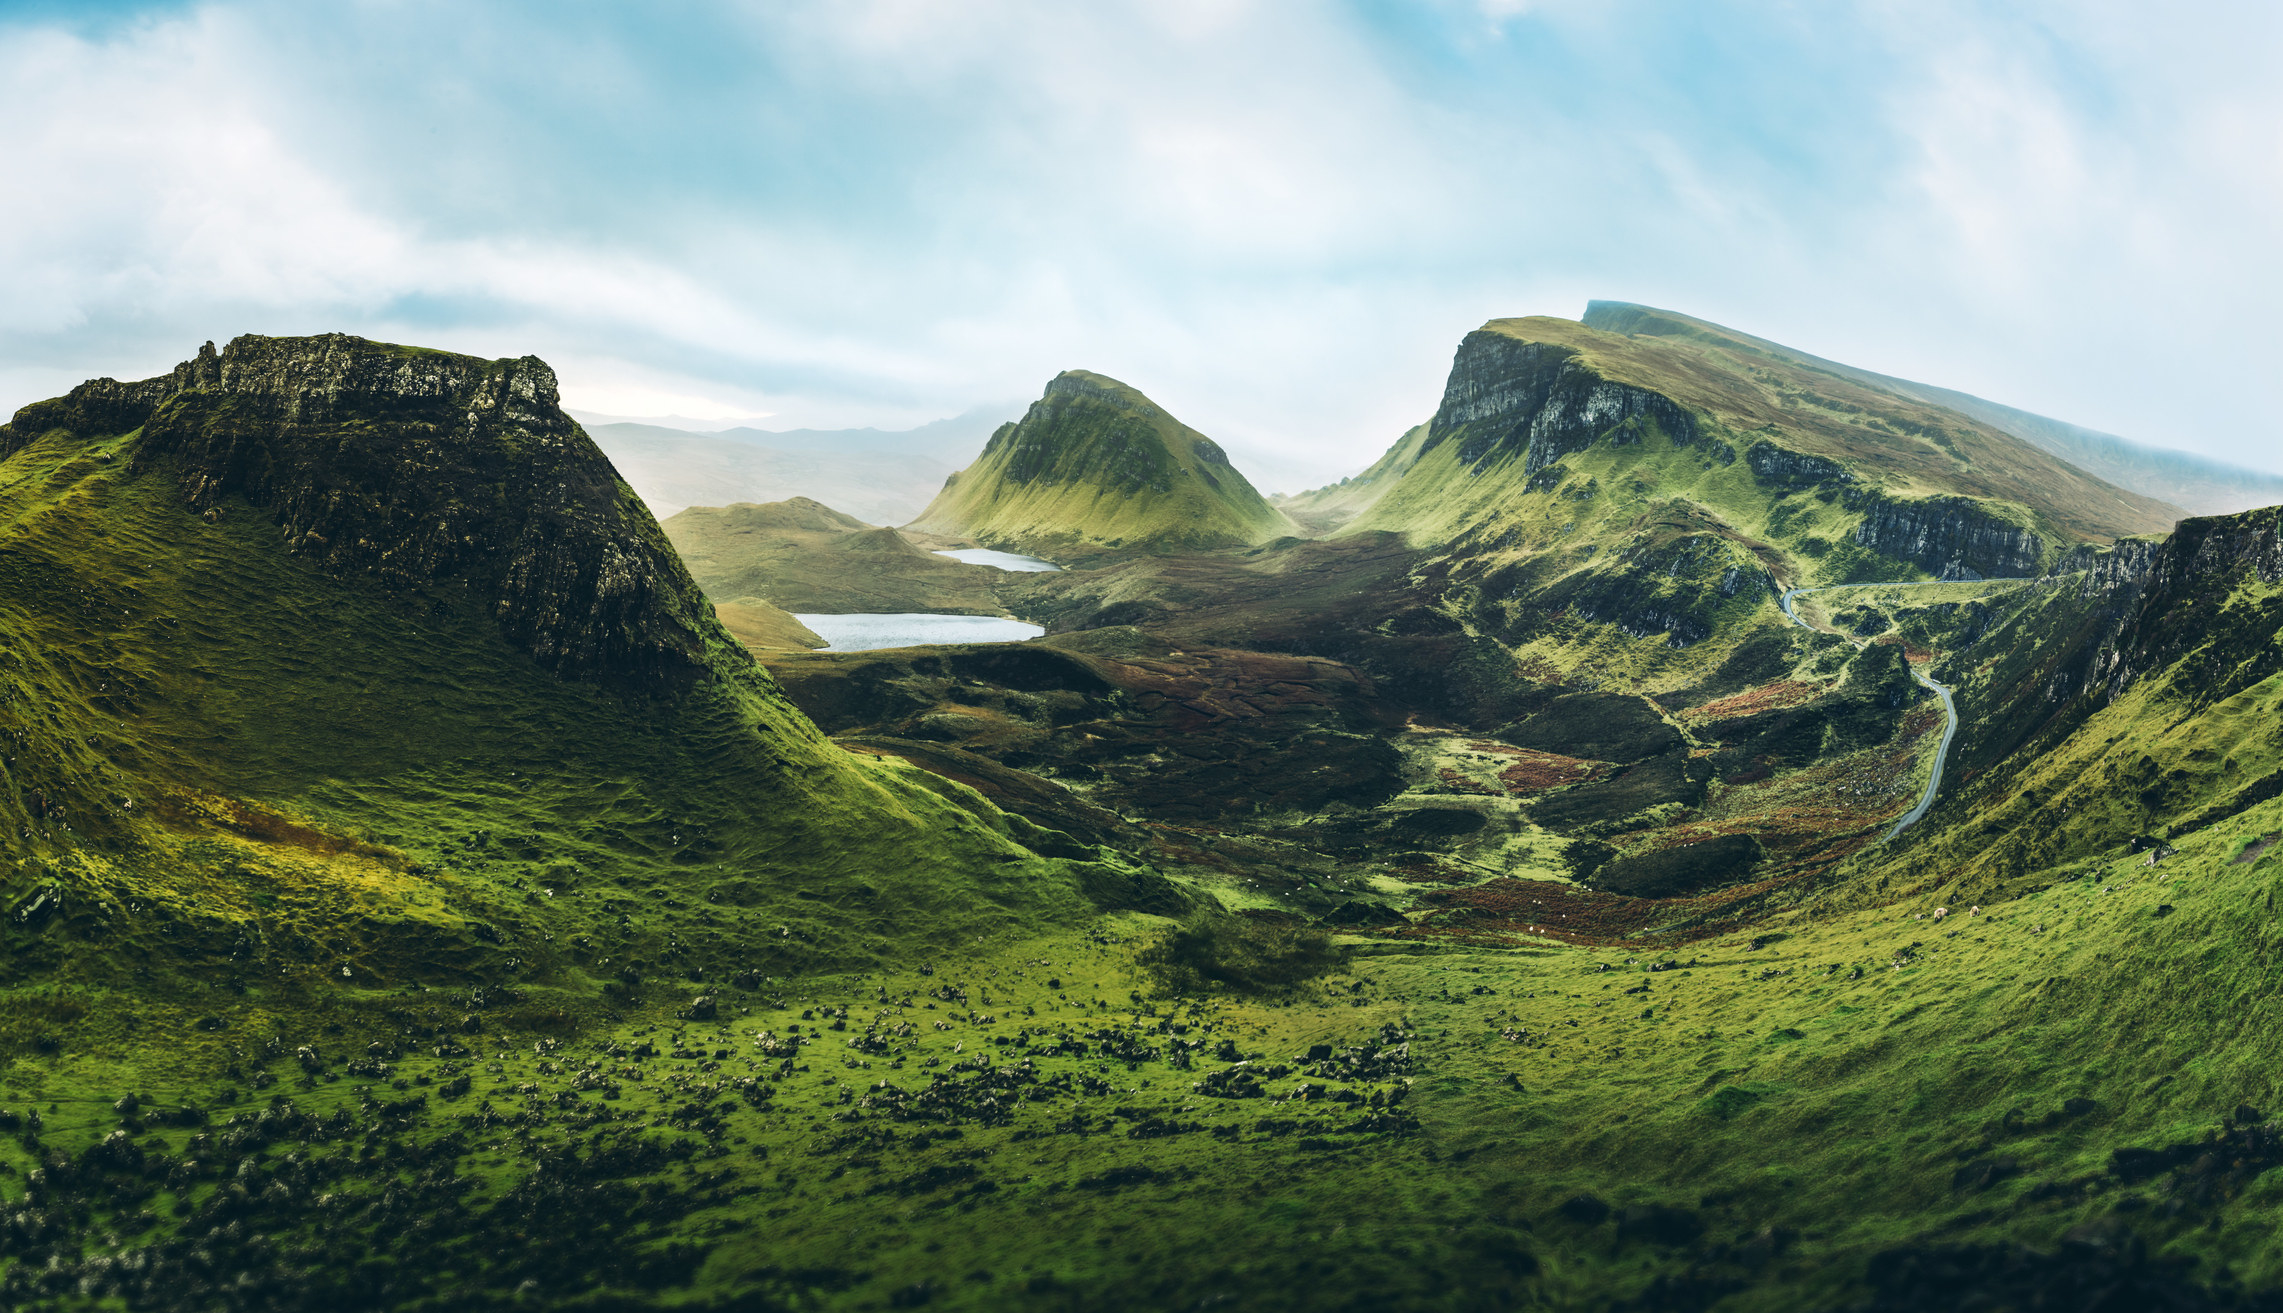 A lush, jutting mountain landscape on the Isle of Skye.